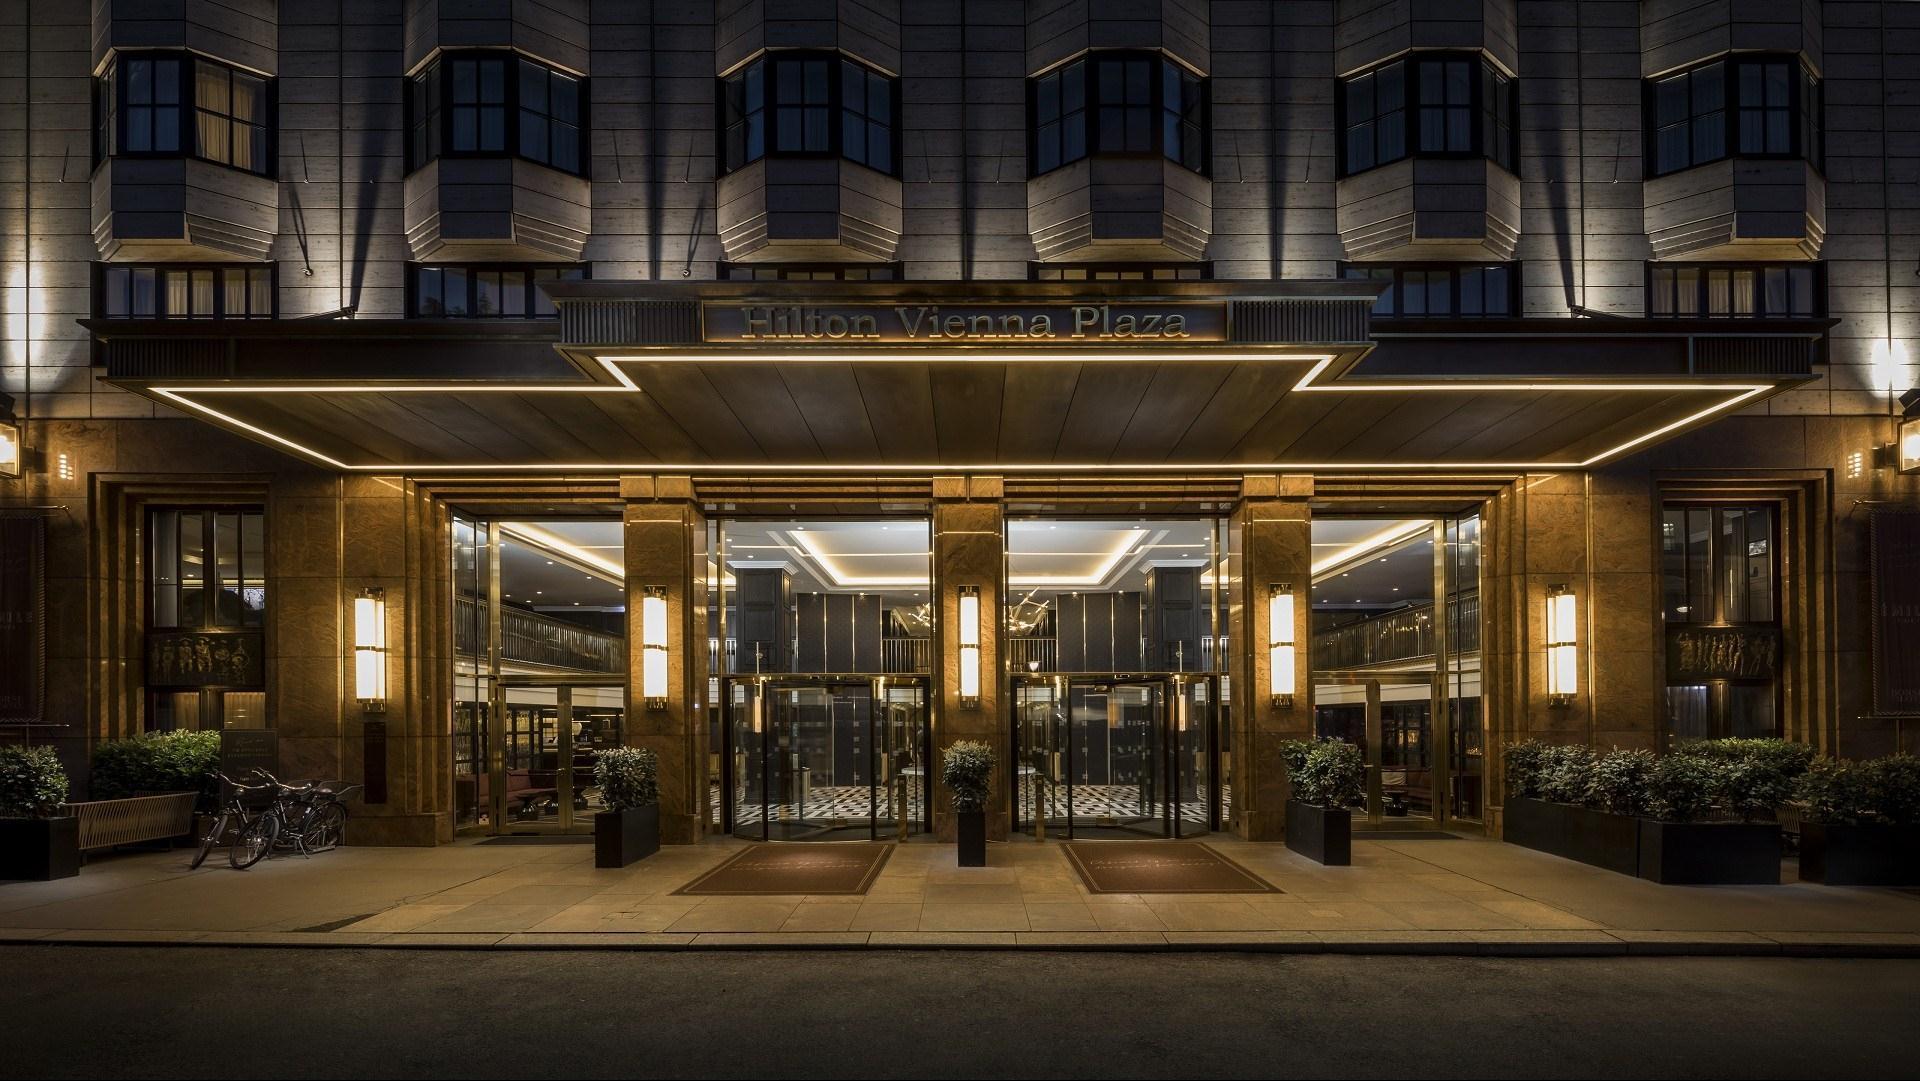 Meeting and event spaces at hilton austria hotels vienna and - Hilton Vienna Plaza Vienna Hotel Select Venue